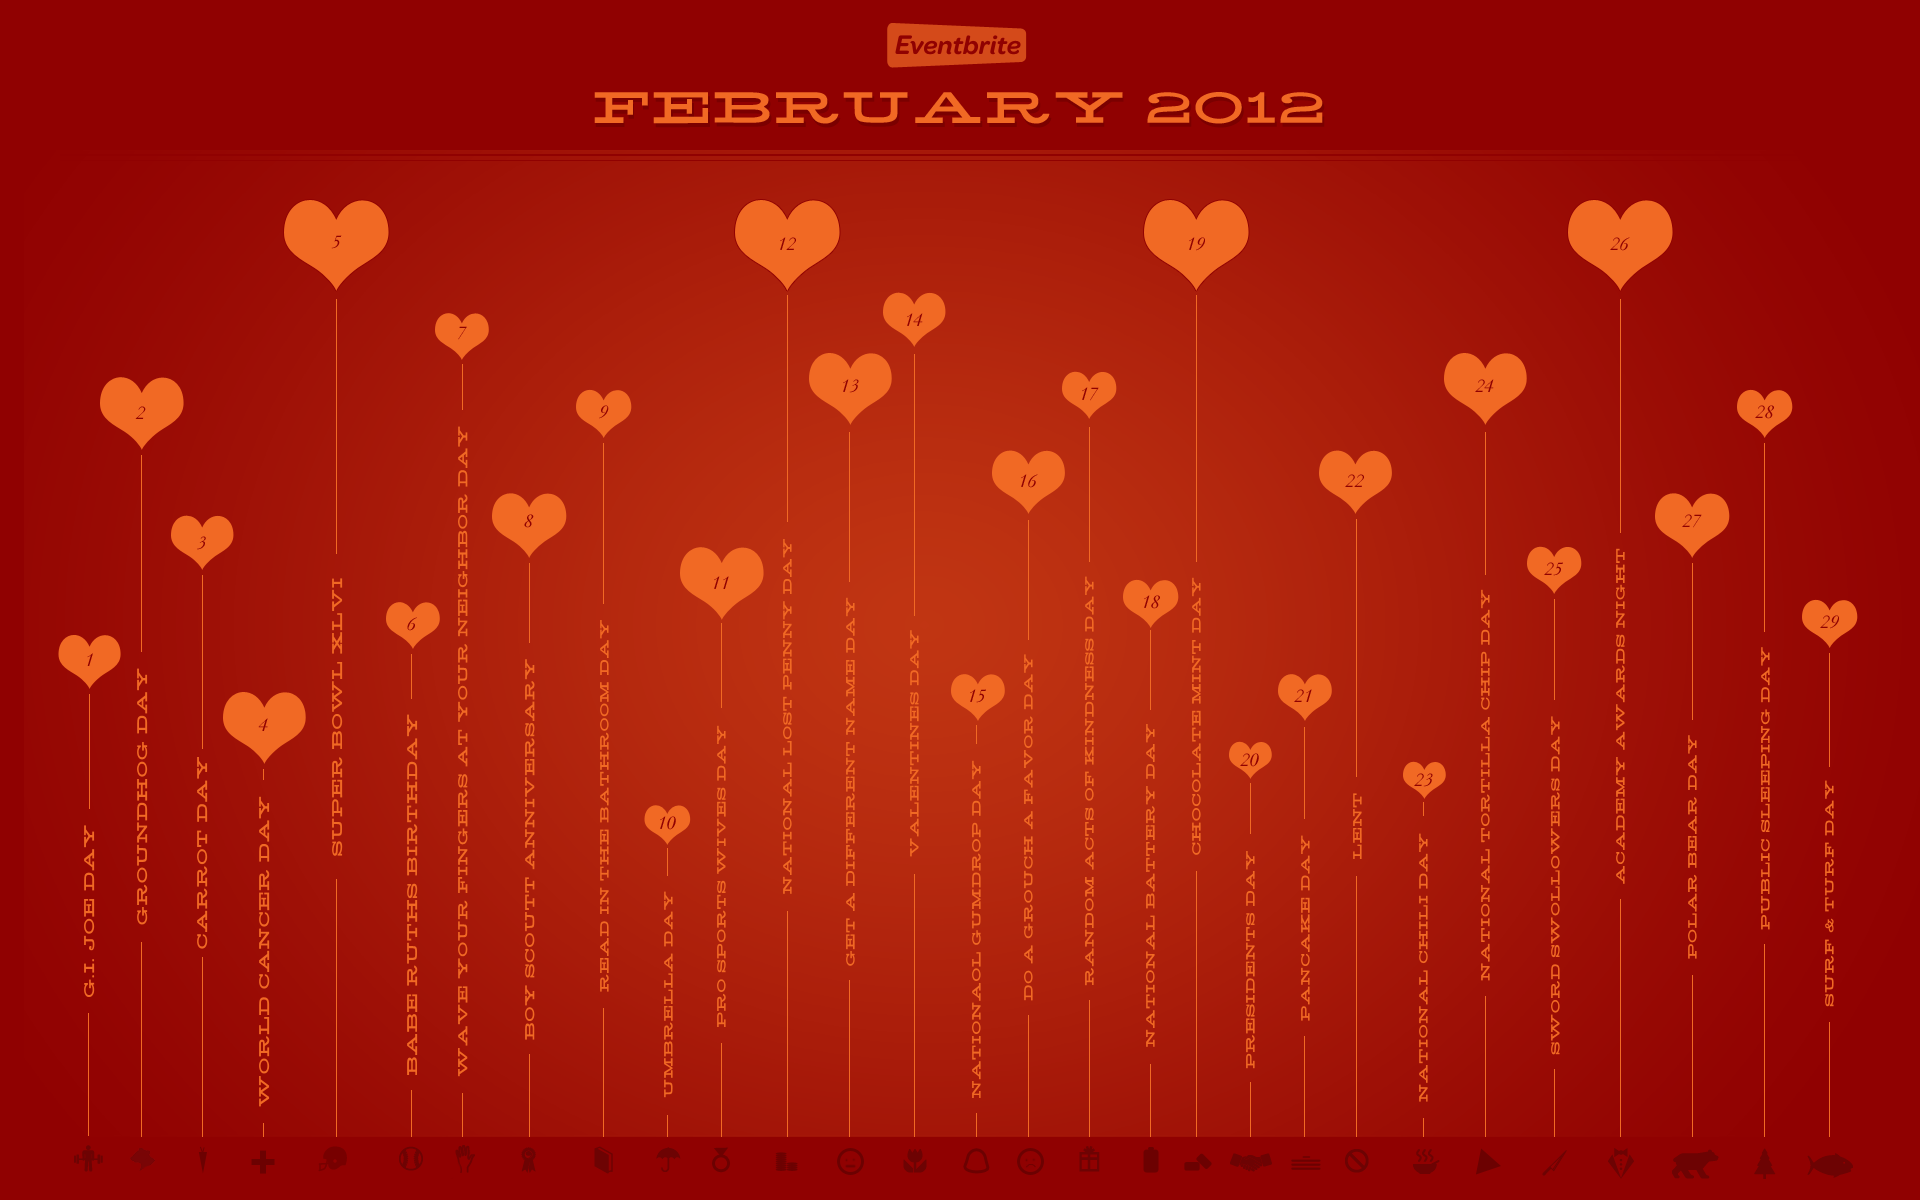 Eventbrite February Desktop Wallpaper for Valentines Day   Eventbrite 1920x1200